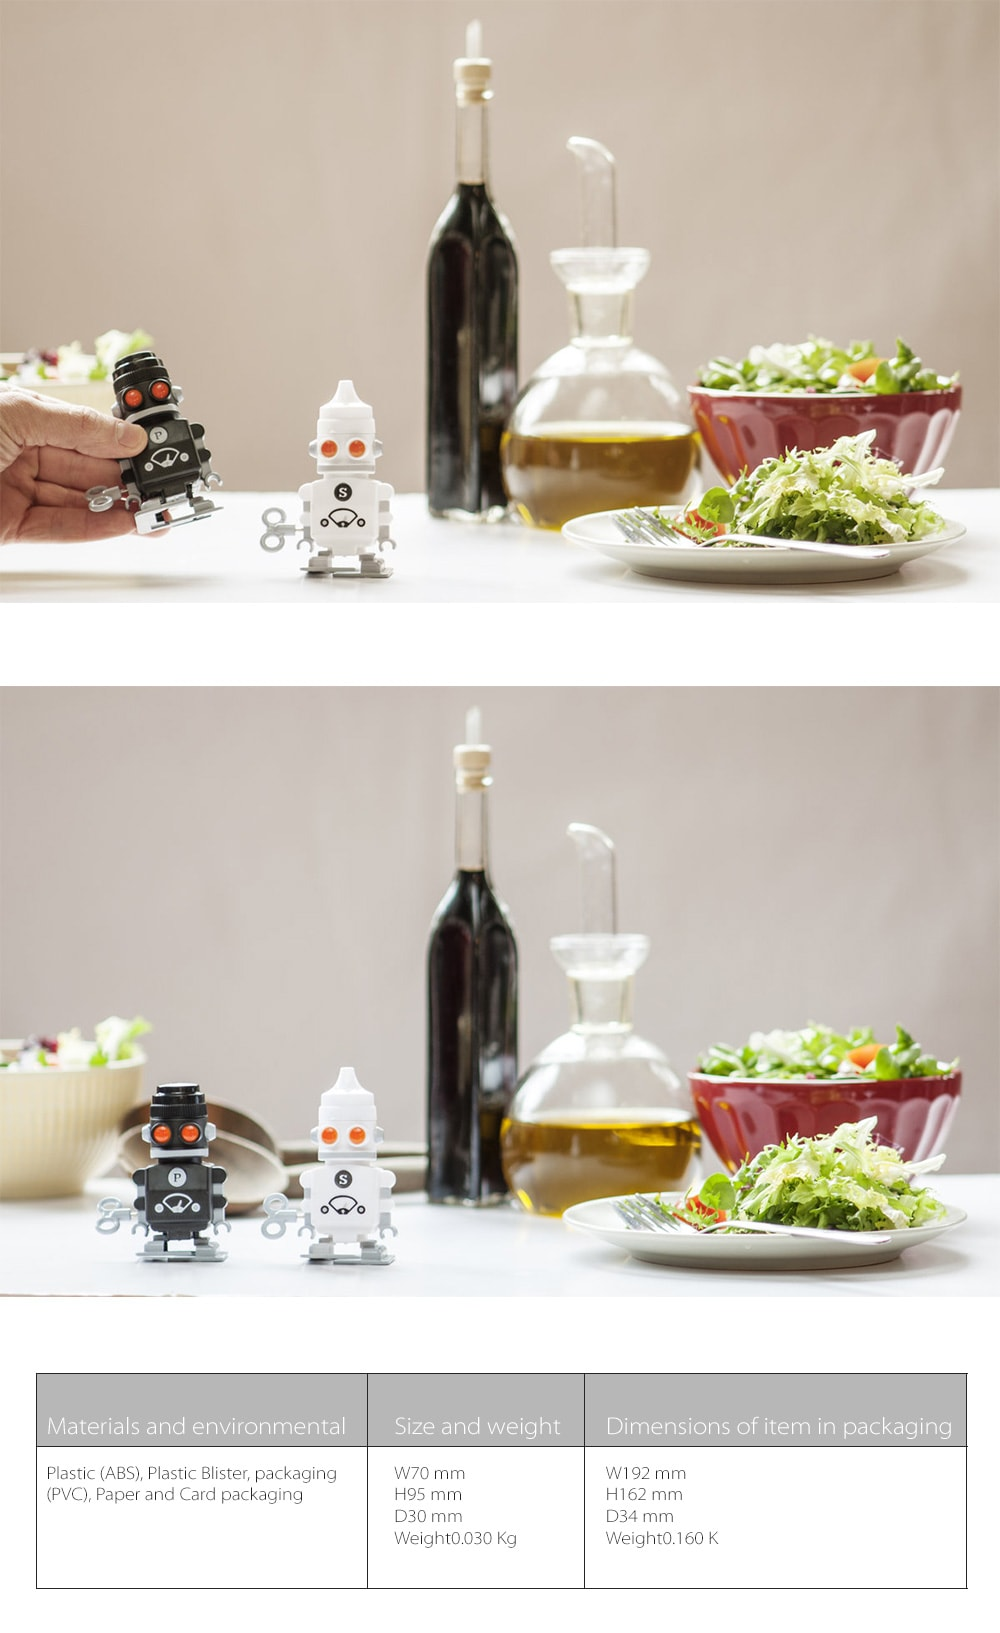 Salt & Pepper Bots Mini Terminators On The Table